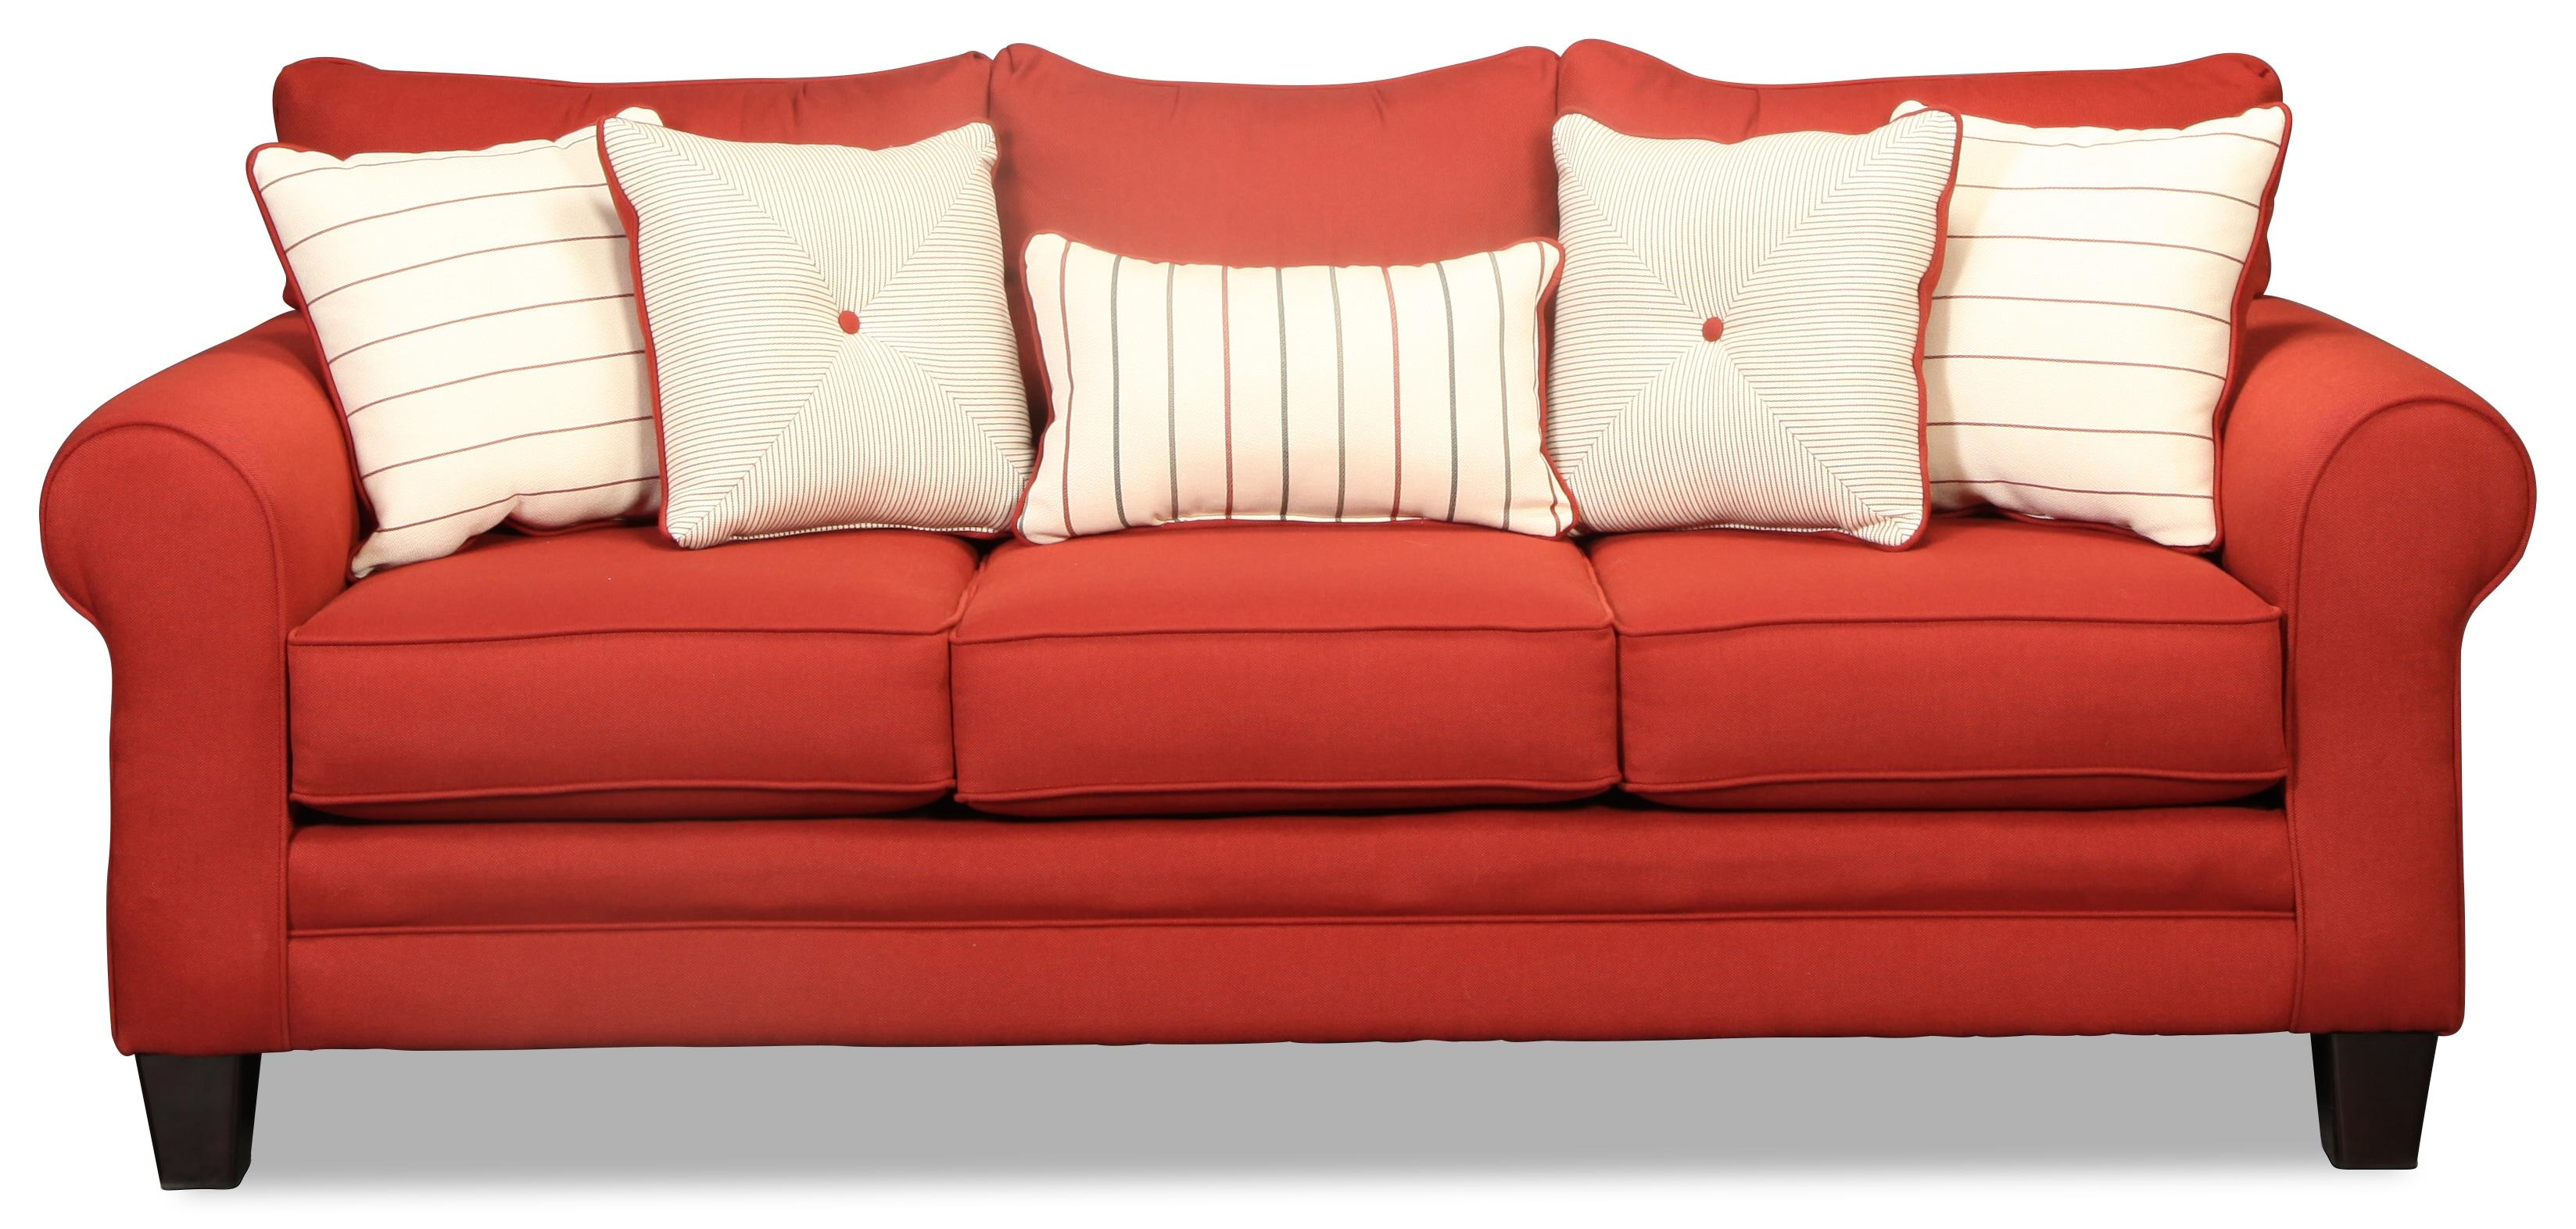 Aspire Sofa- Red